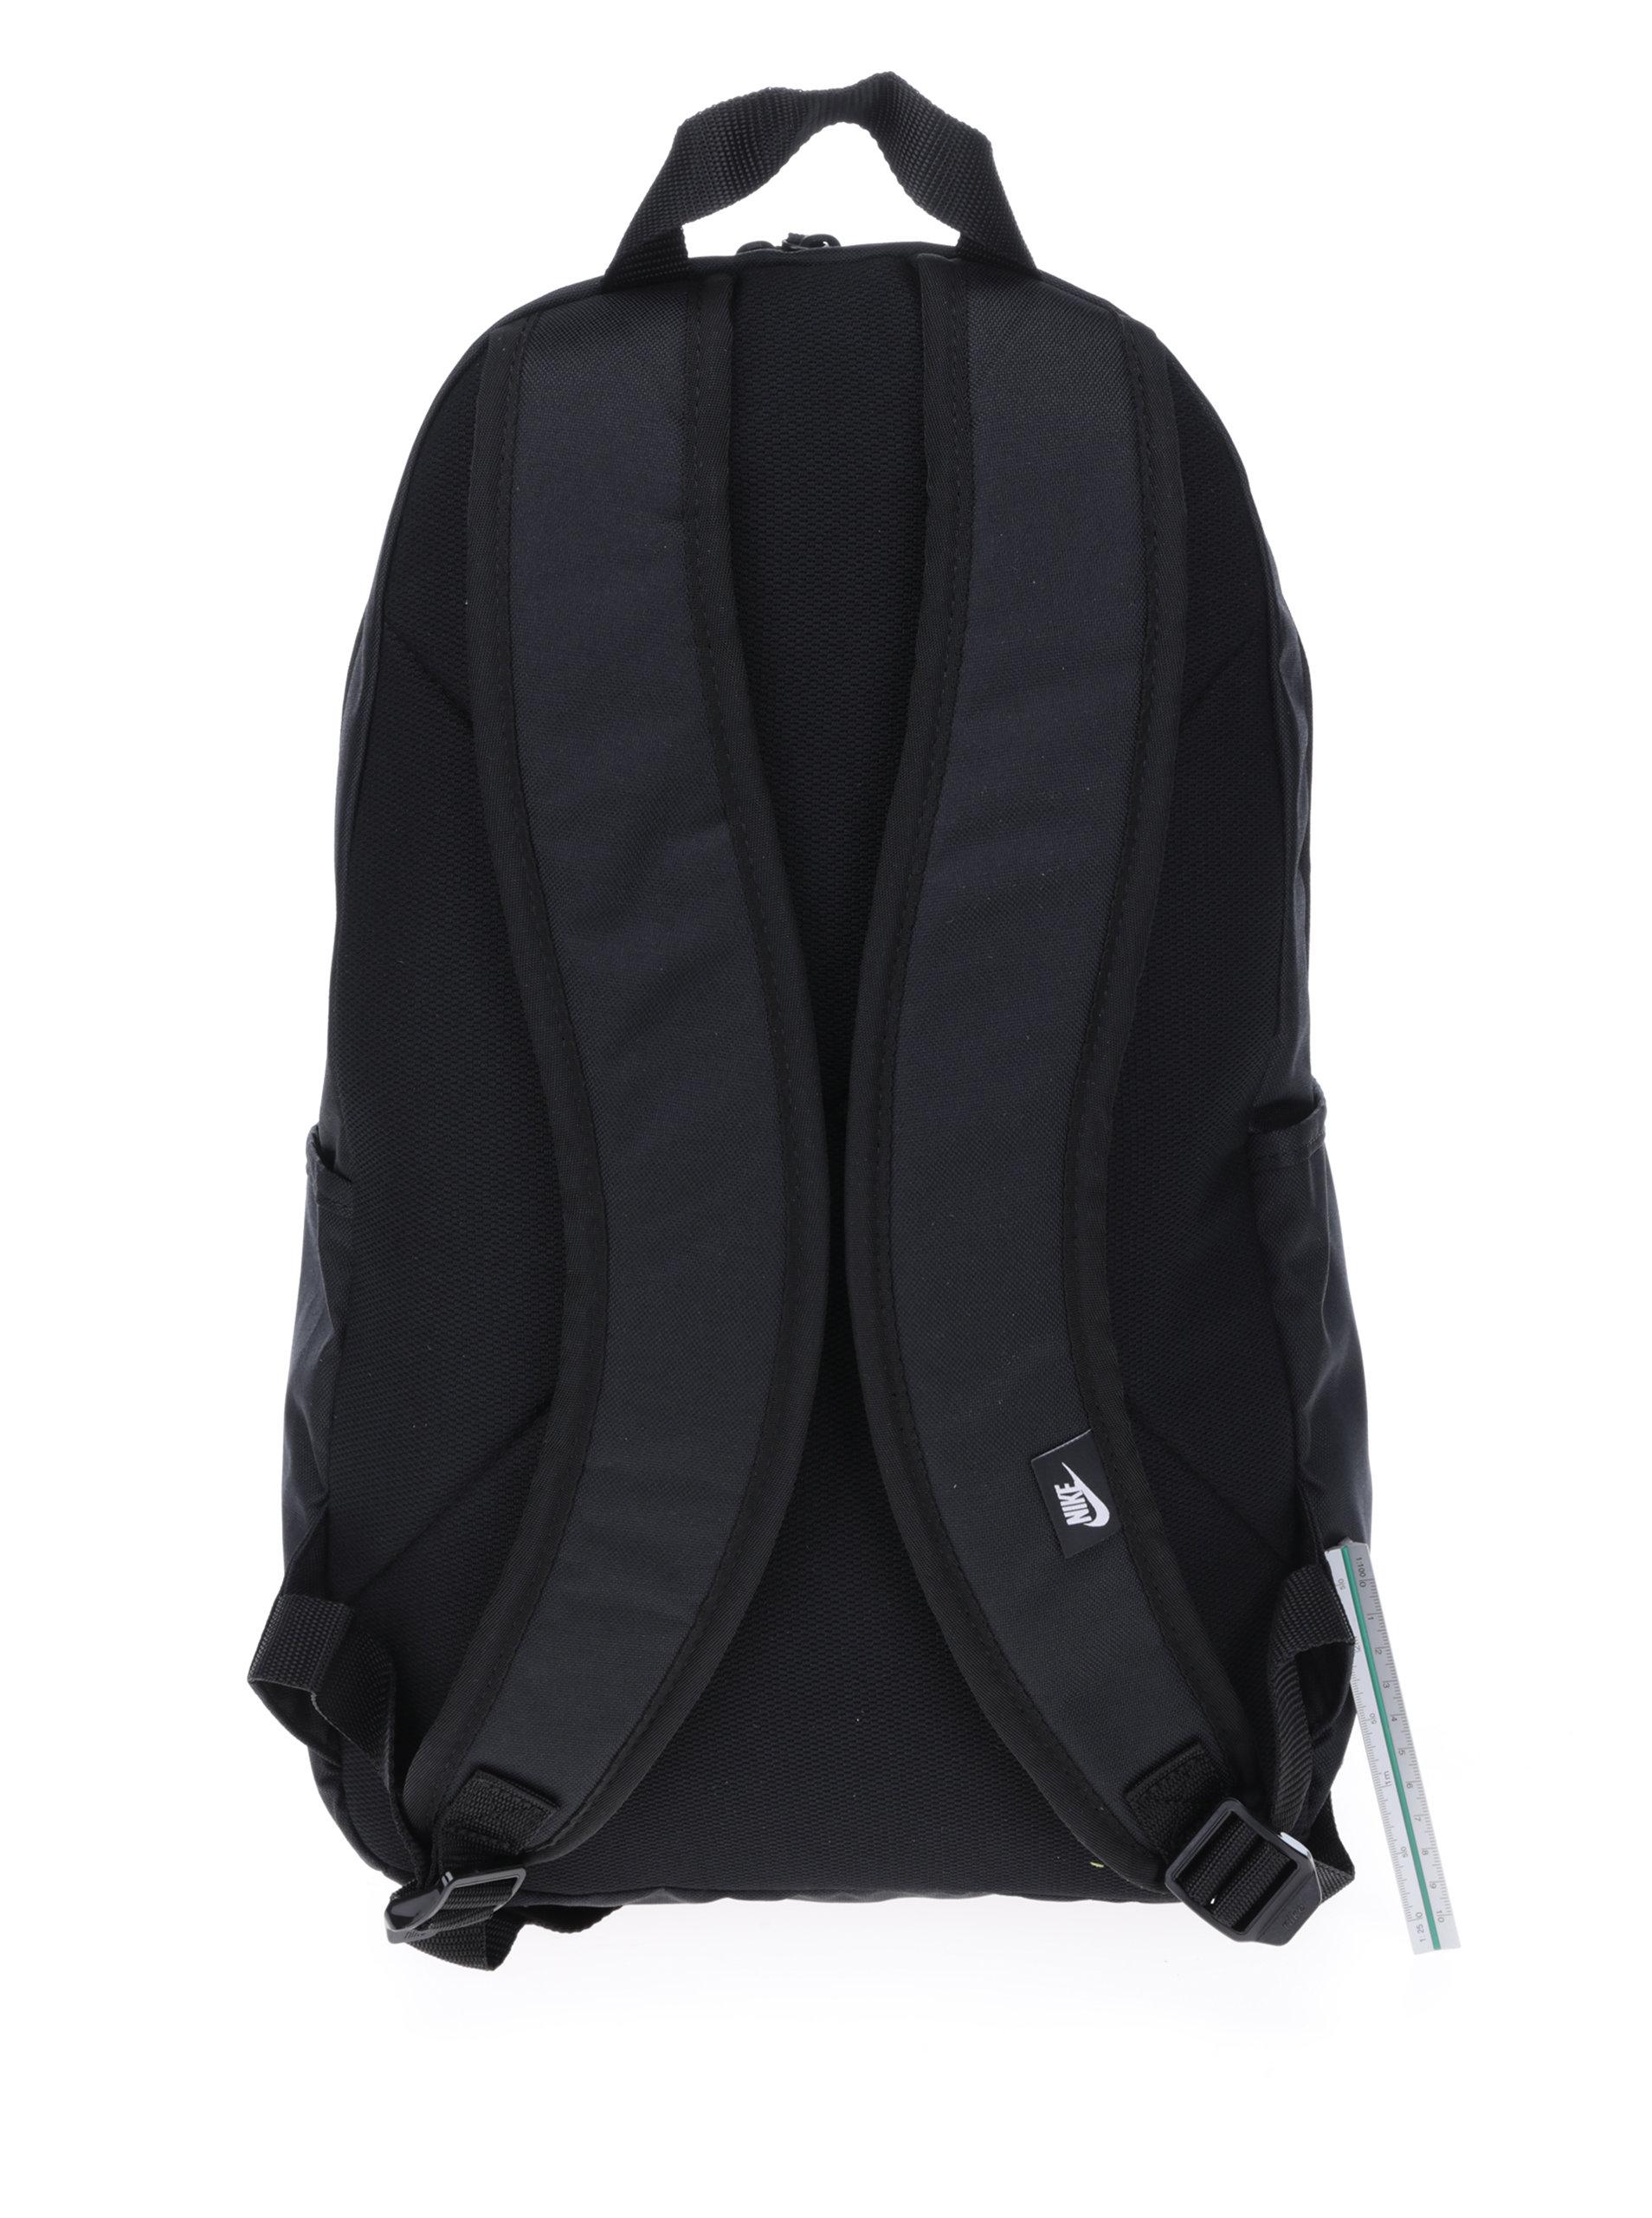 bc6f6ed5b5 Čierny batoh s potlačou Nike Elemental ...